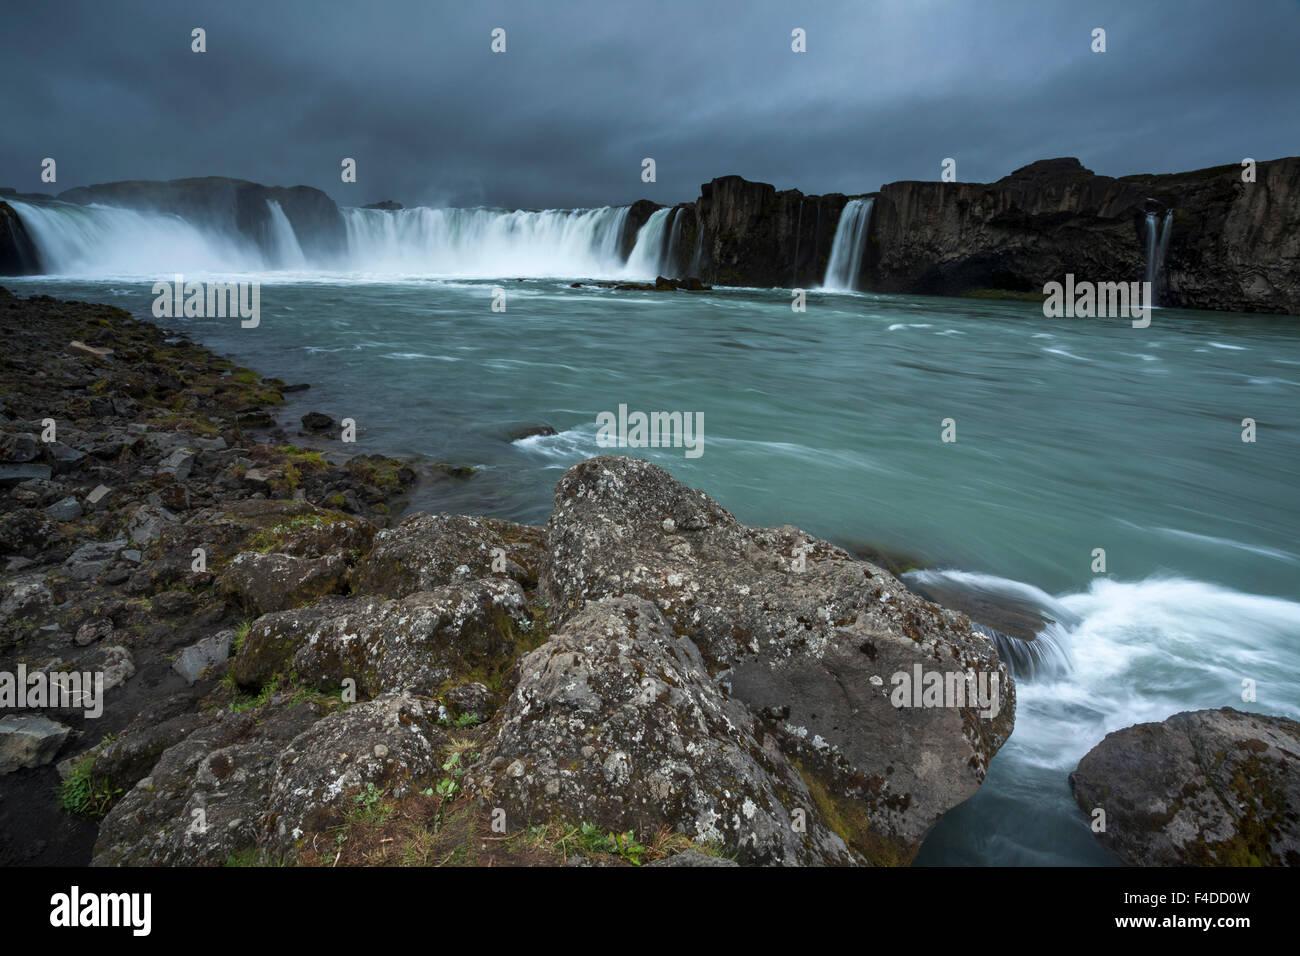 Cascade Godafoss et Skjalfandafljot Nordhurland Eystra, rivière, de l'Islande. Photo Stock